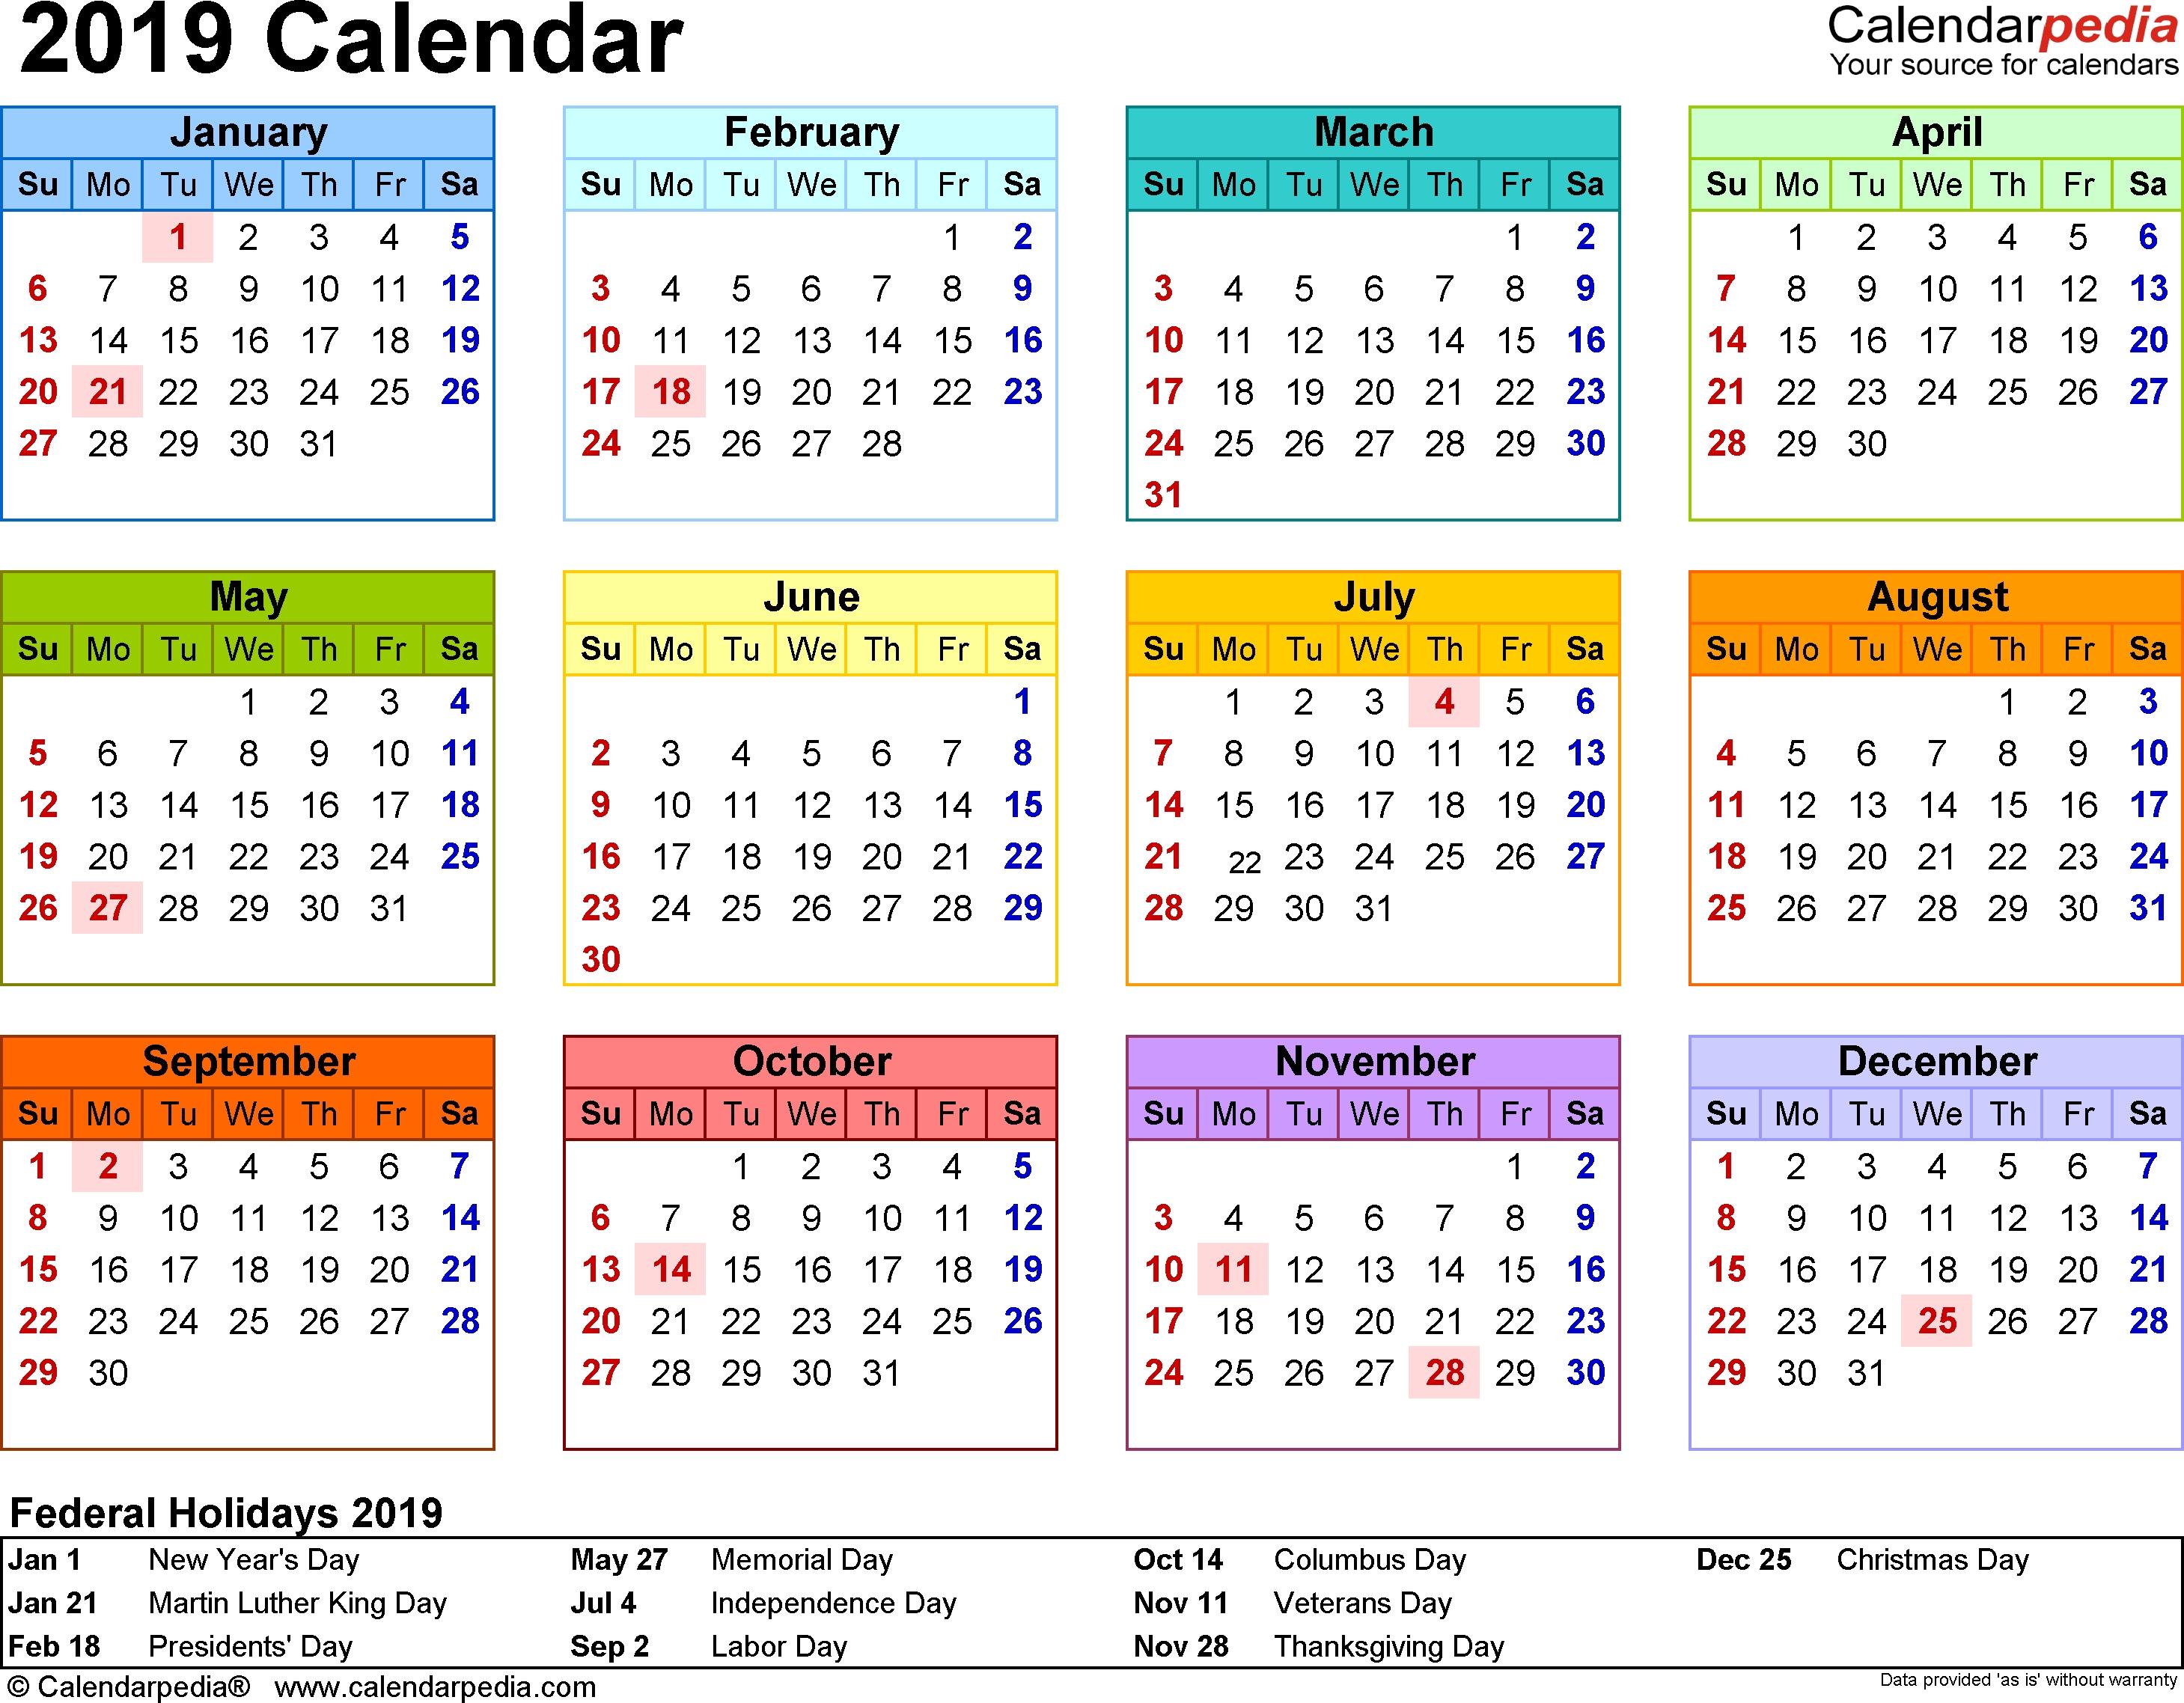 2019 Calendar Download 17 Free Printable Excel Templates Xlsx